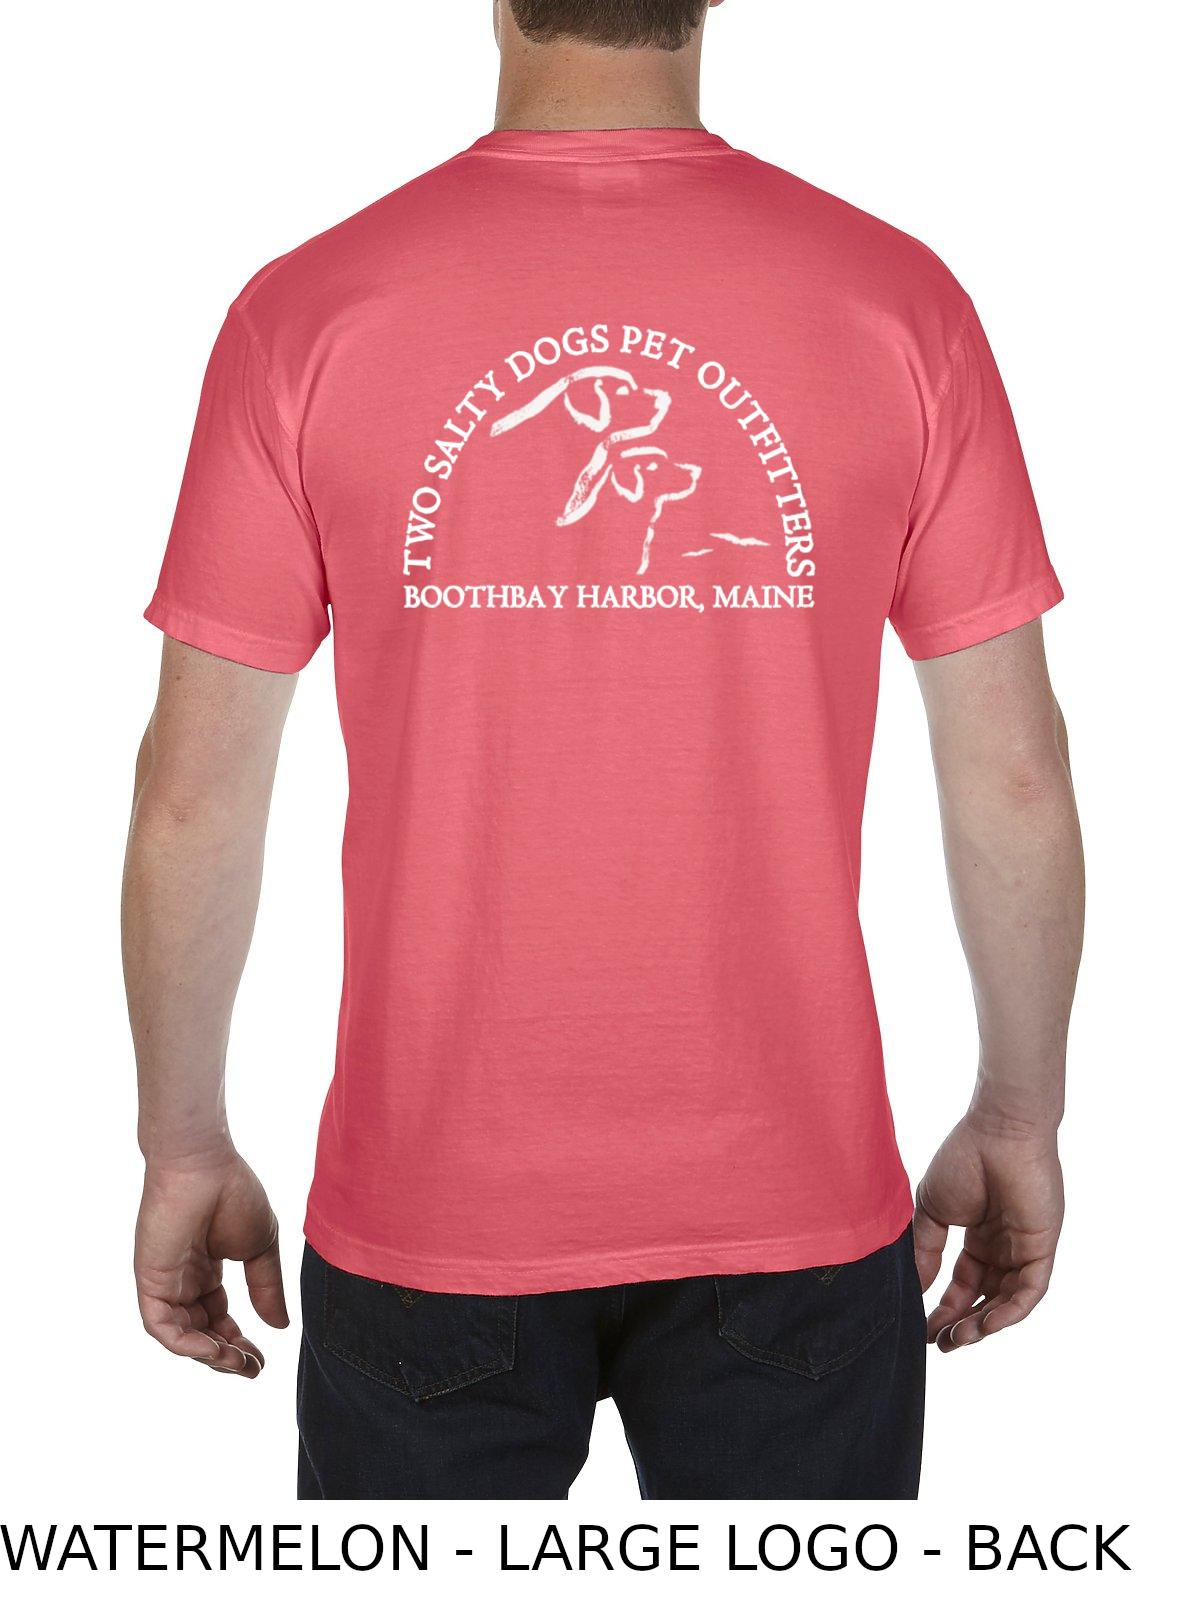 bbha-ss-t-shirt-pocket-watermelon-back